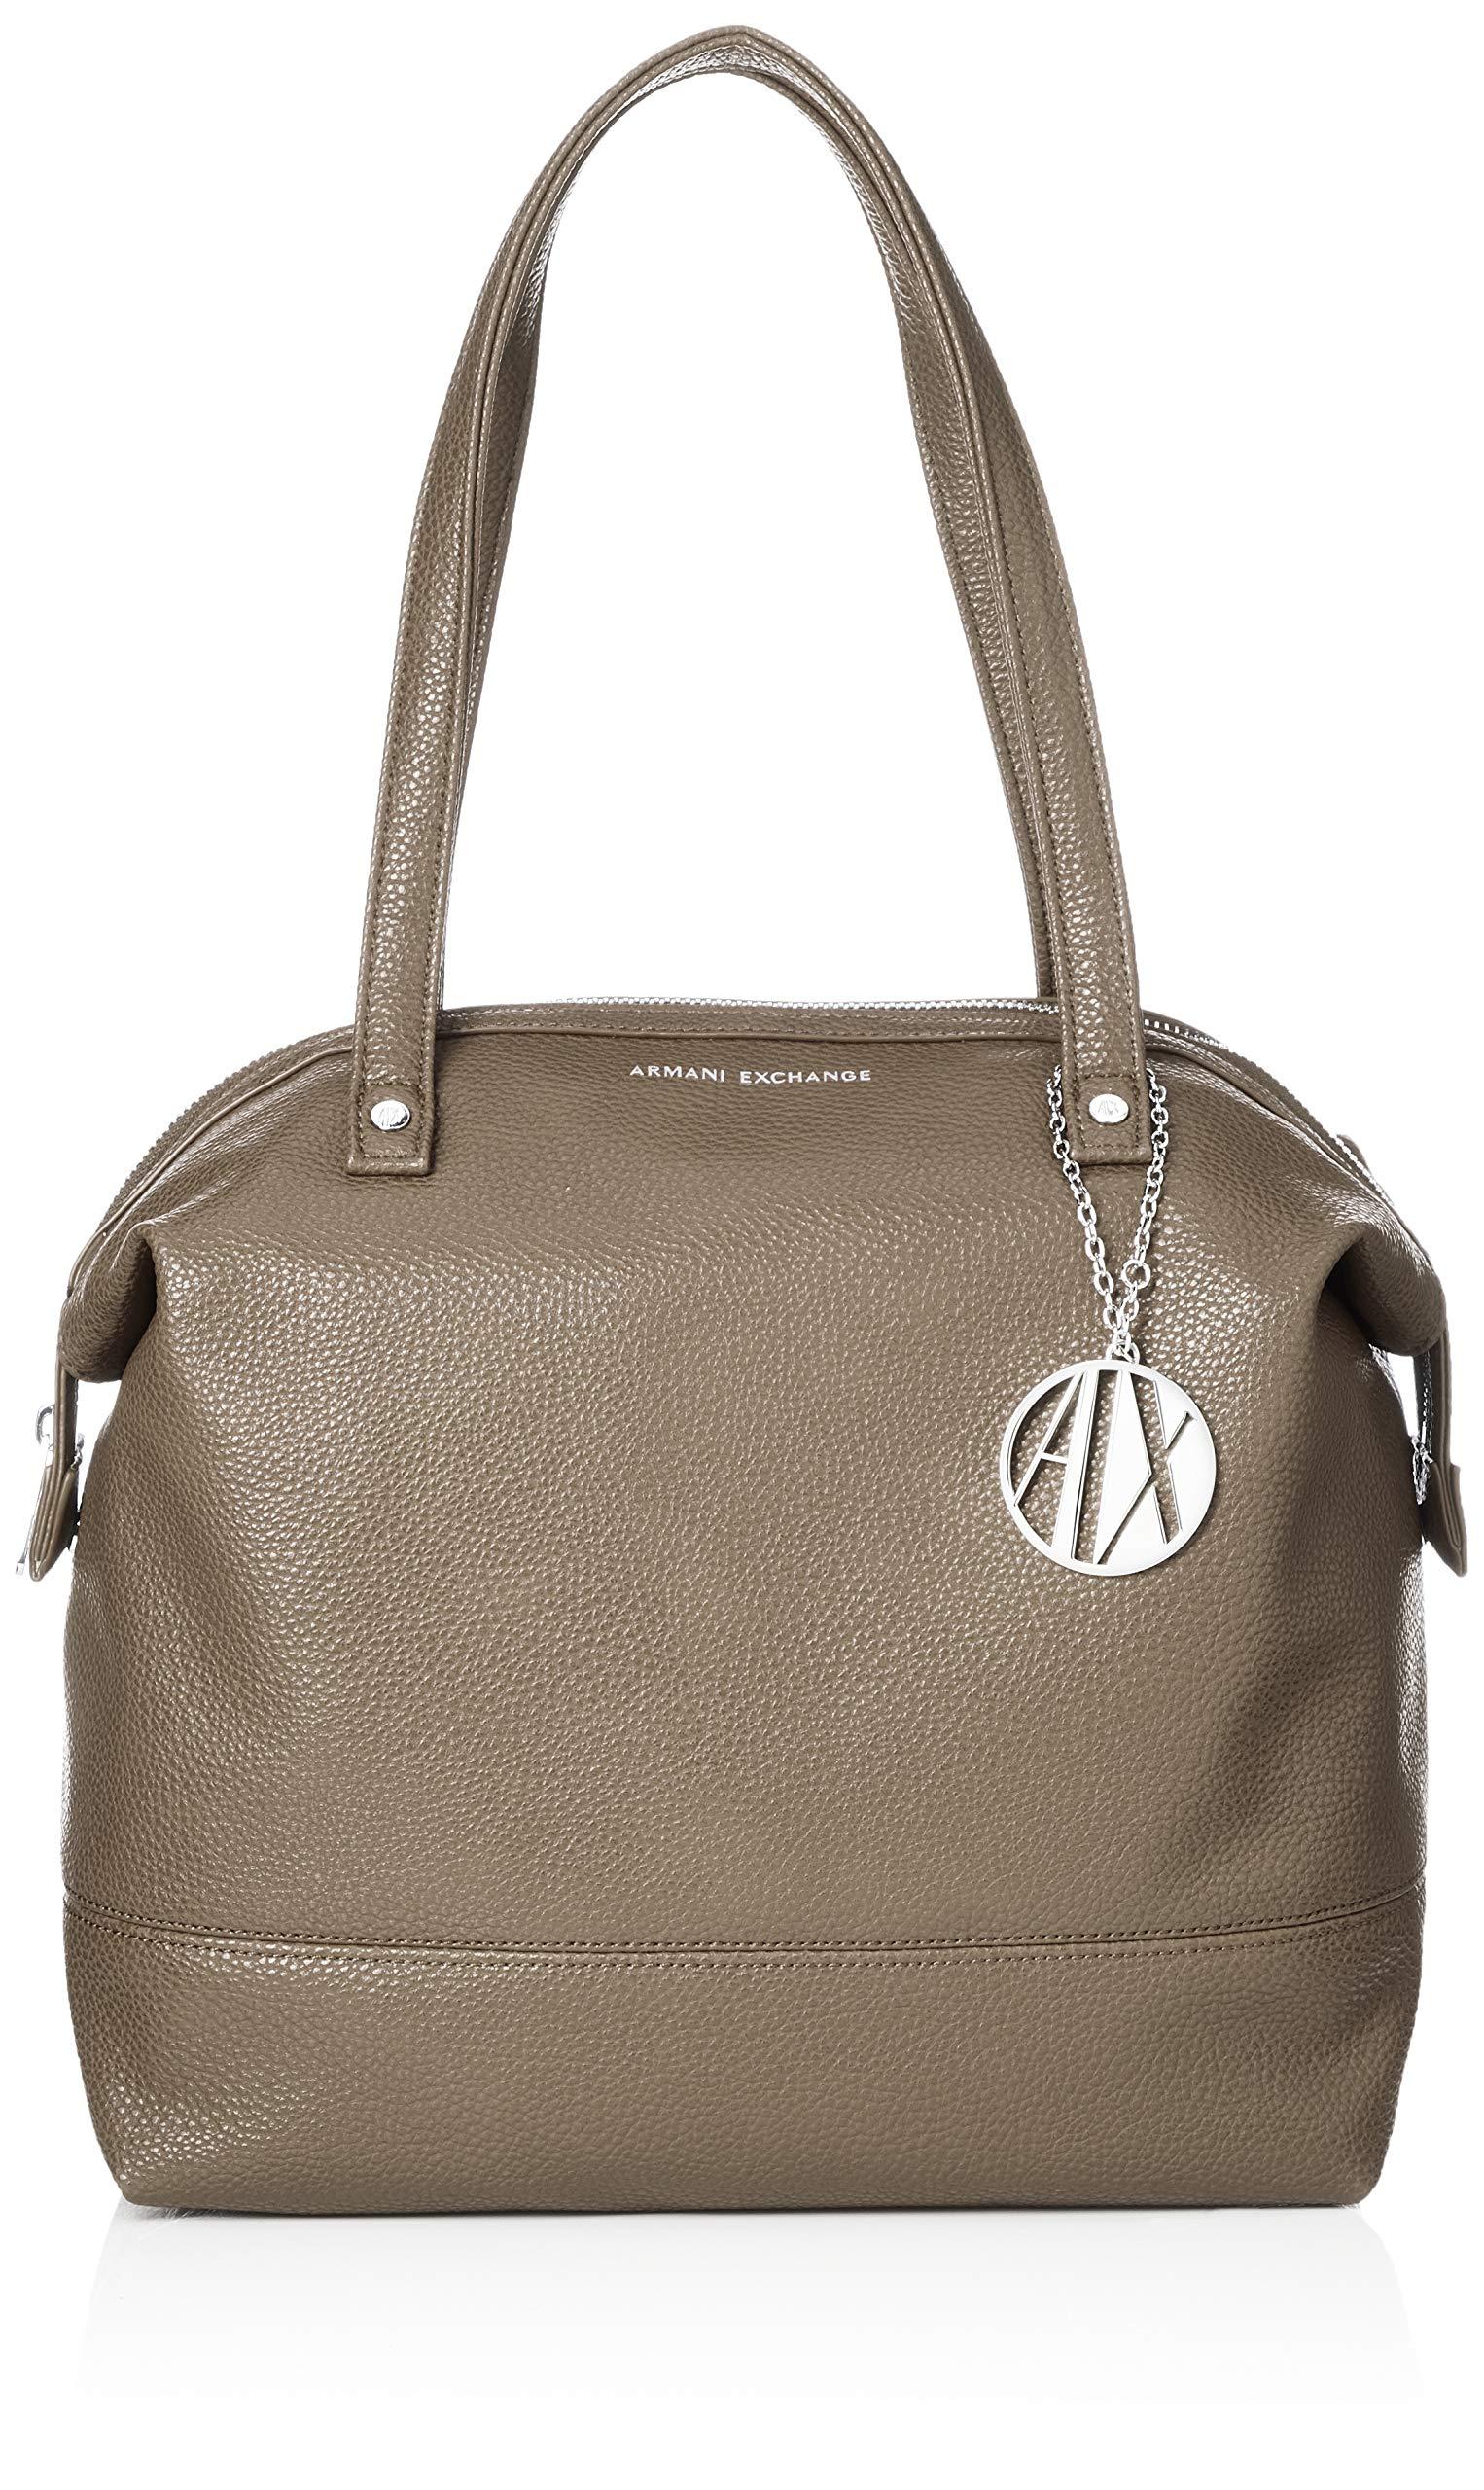 Armani T FemmeMarrontaupe31x16x52 X Cmb Bag Tote Exchange H LeatherCabas QdxthsrC